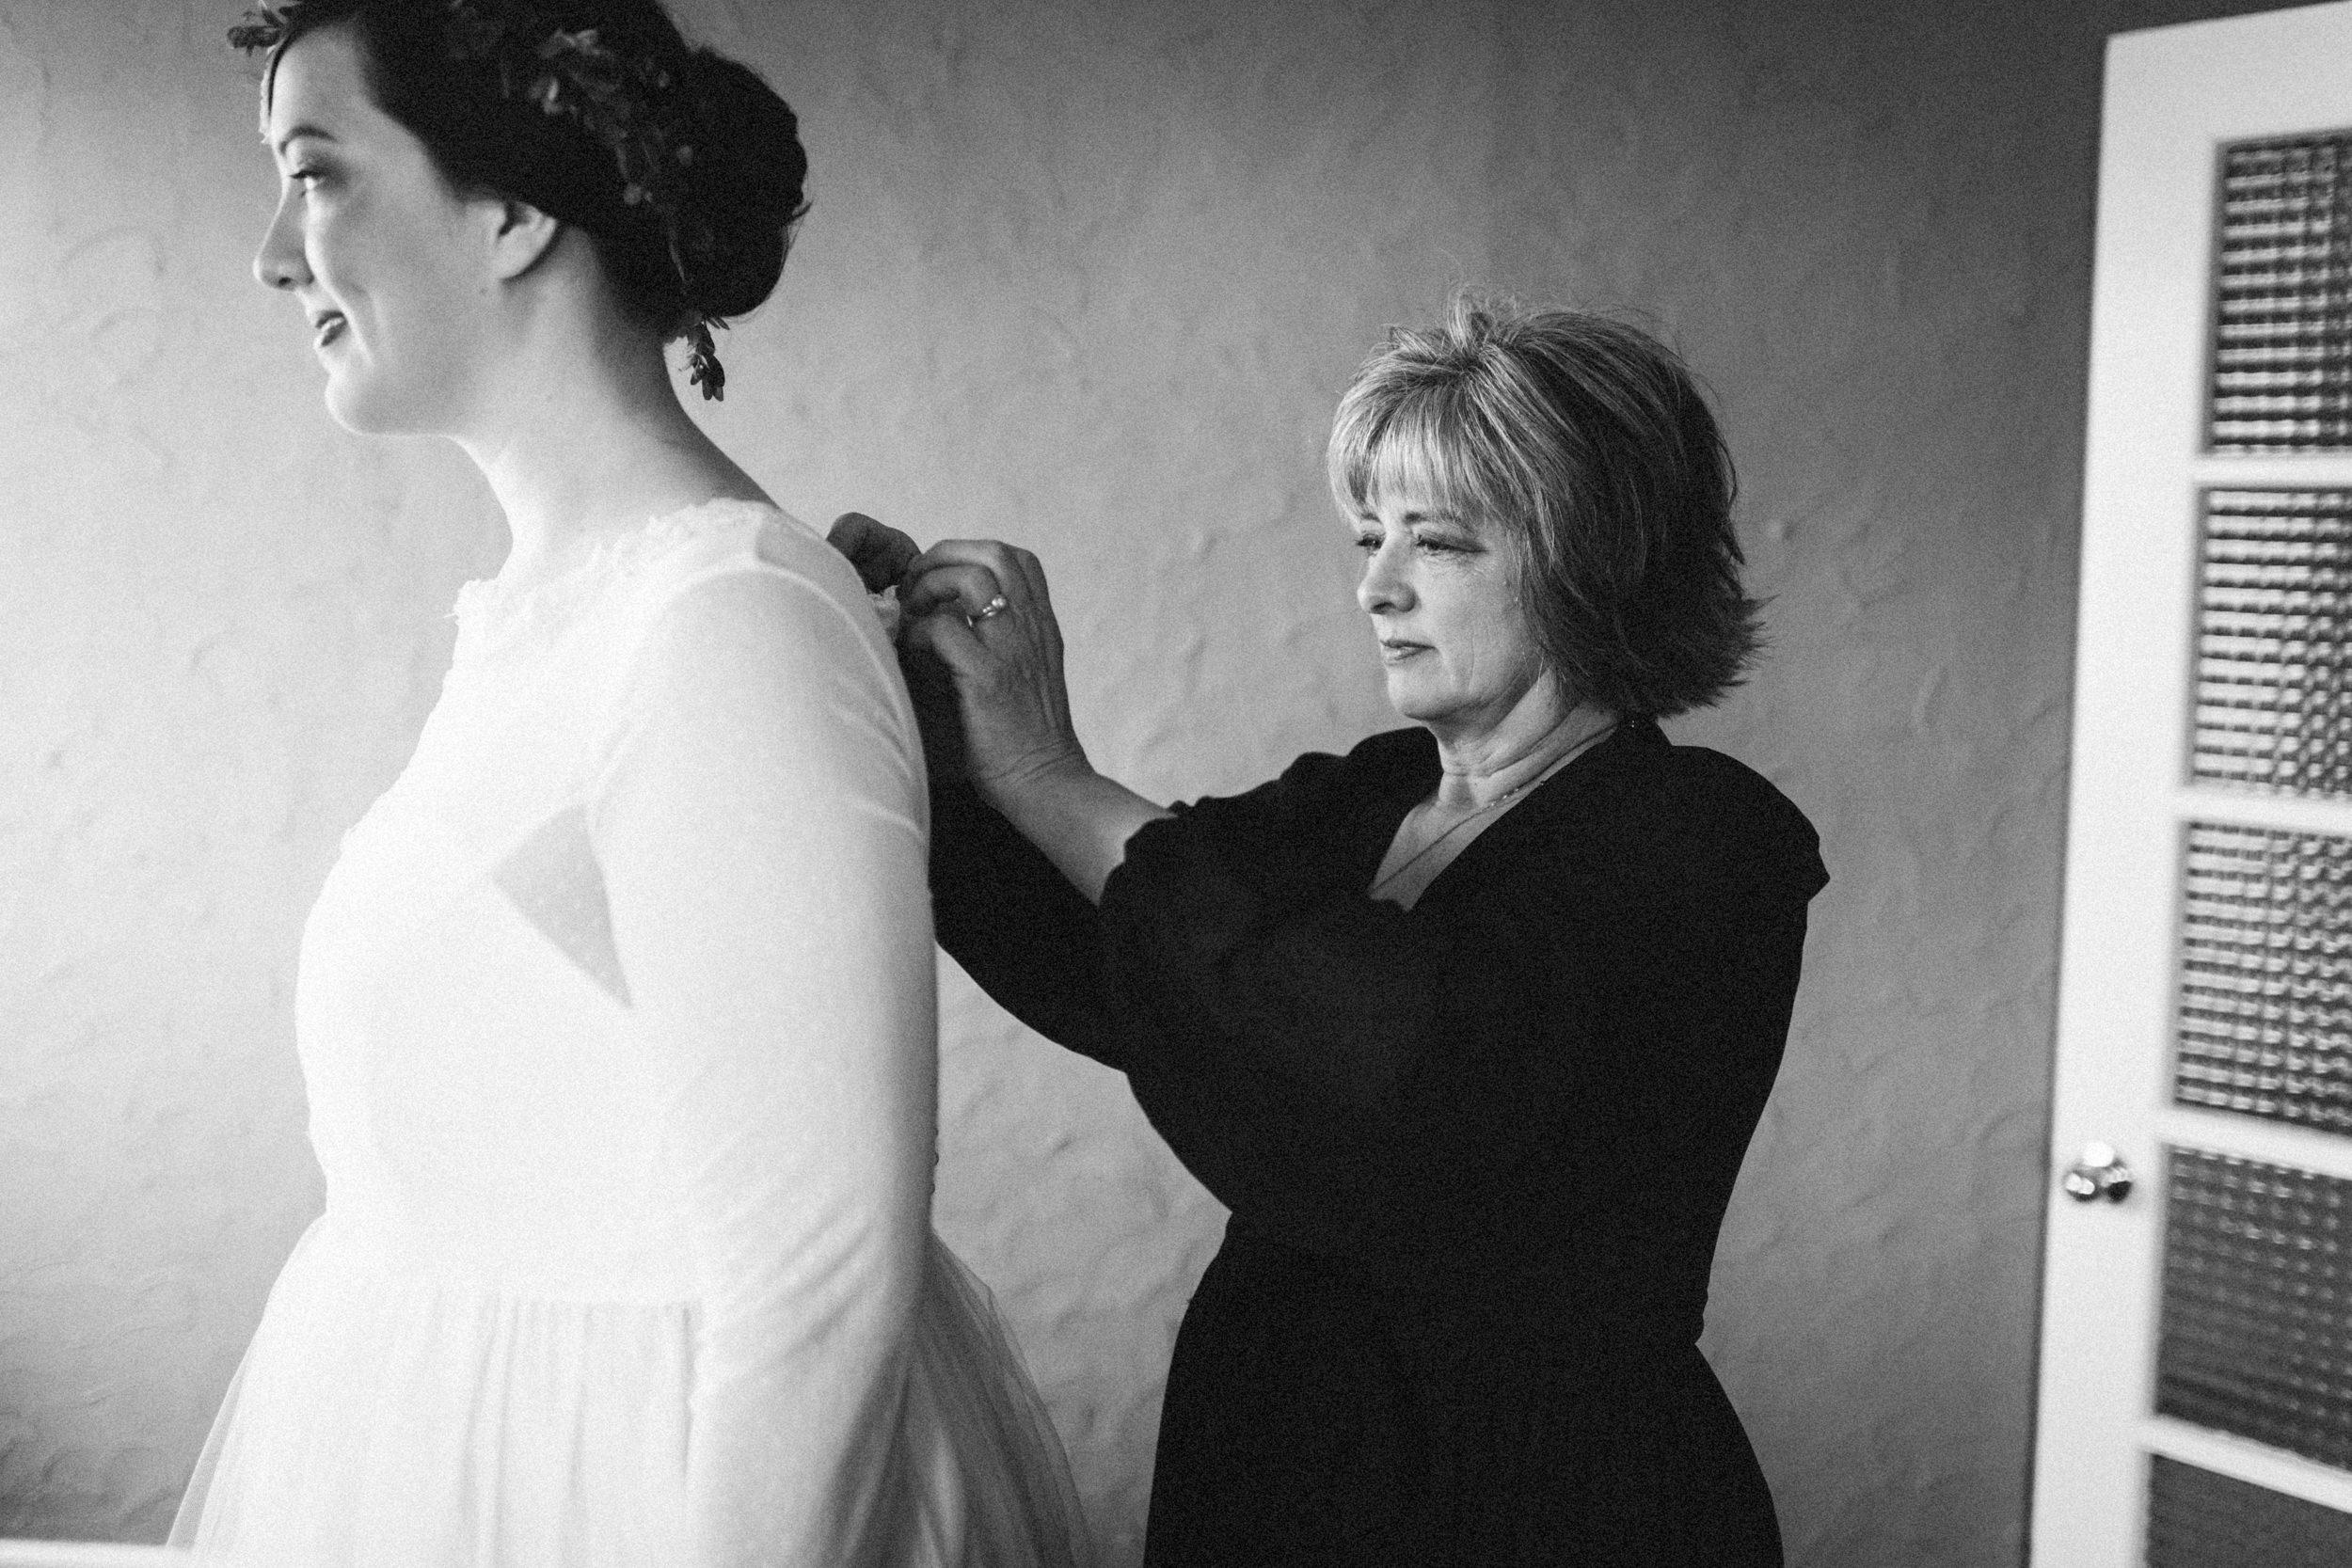 lauren-dean-wedding-grand-lodge-kentucky-sarah-katherine-davis-photography-75bw.jpg